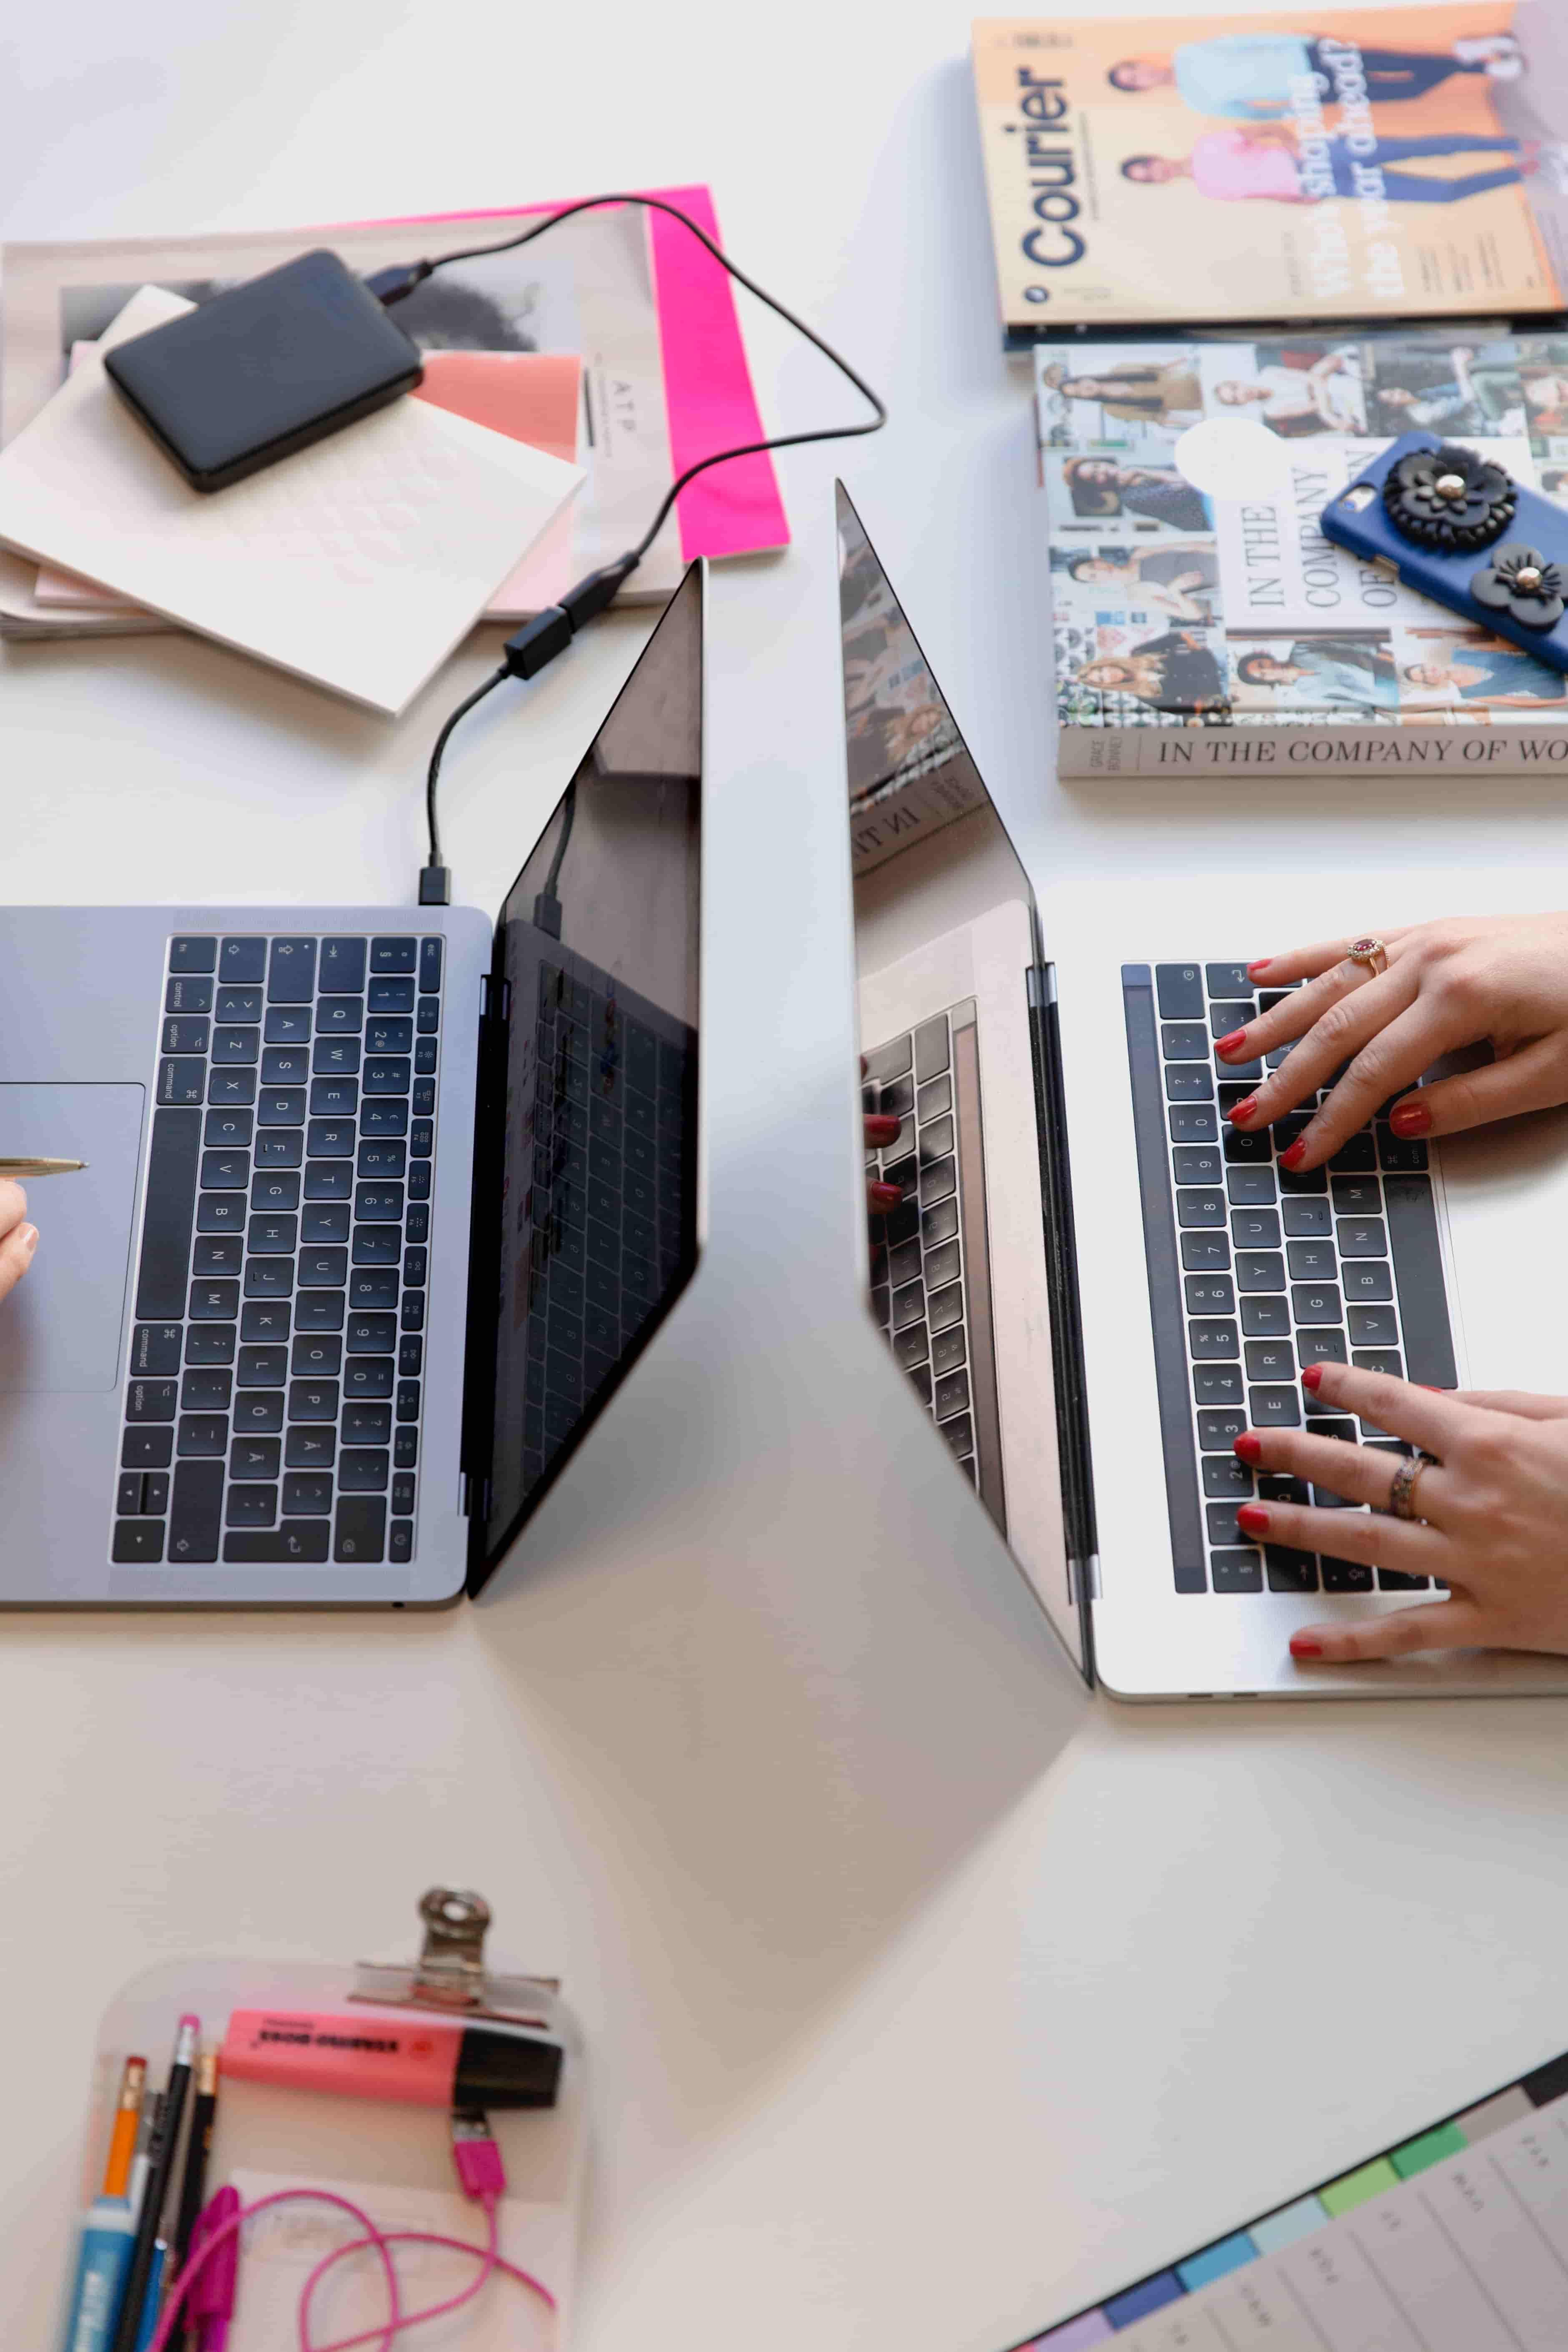 Business tools for collaboration drive enterprise success